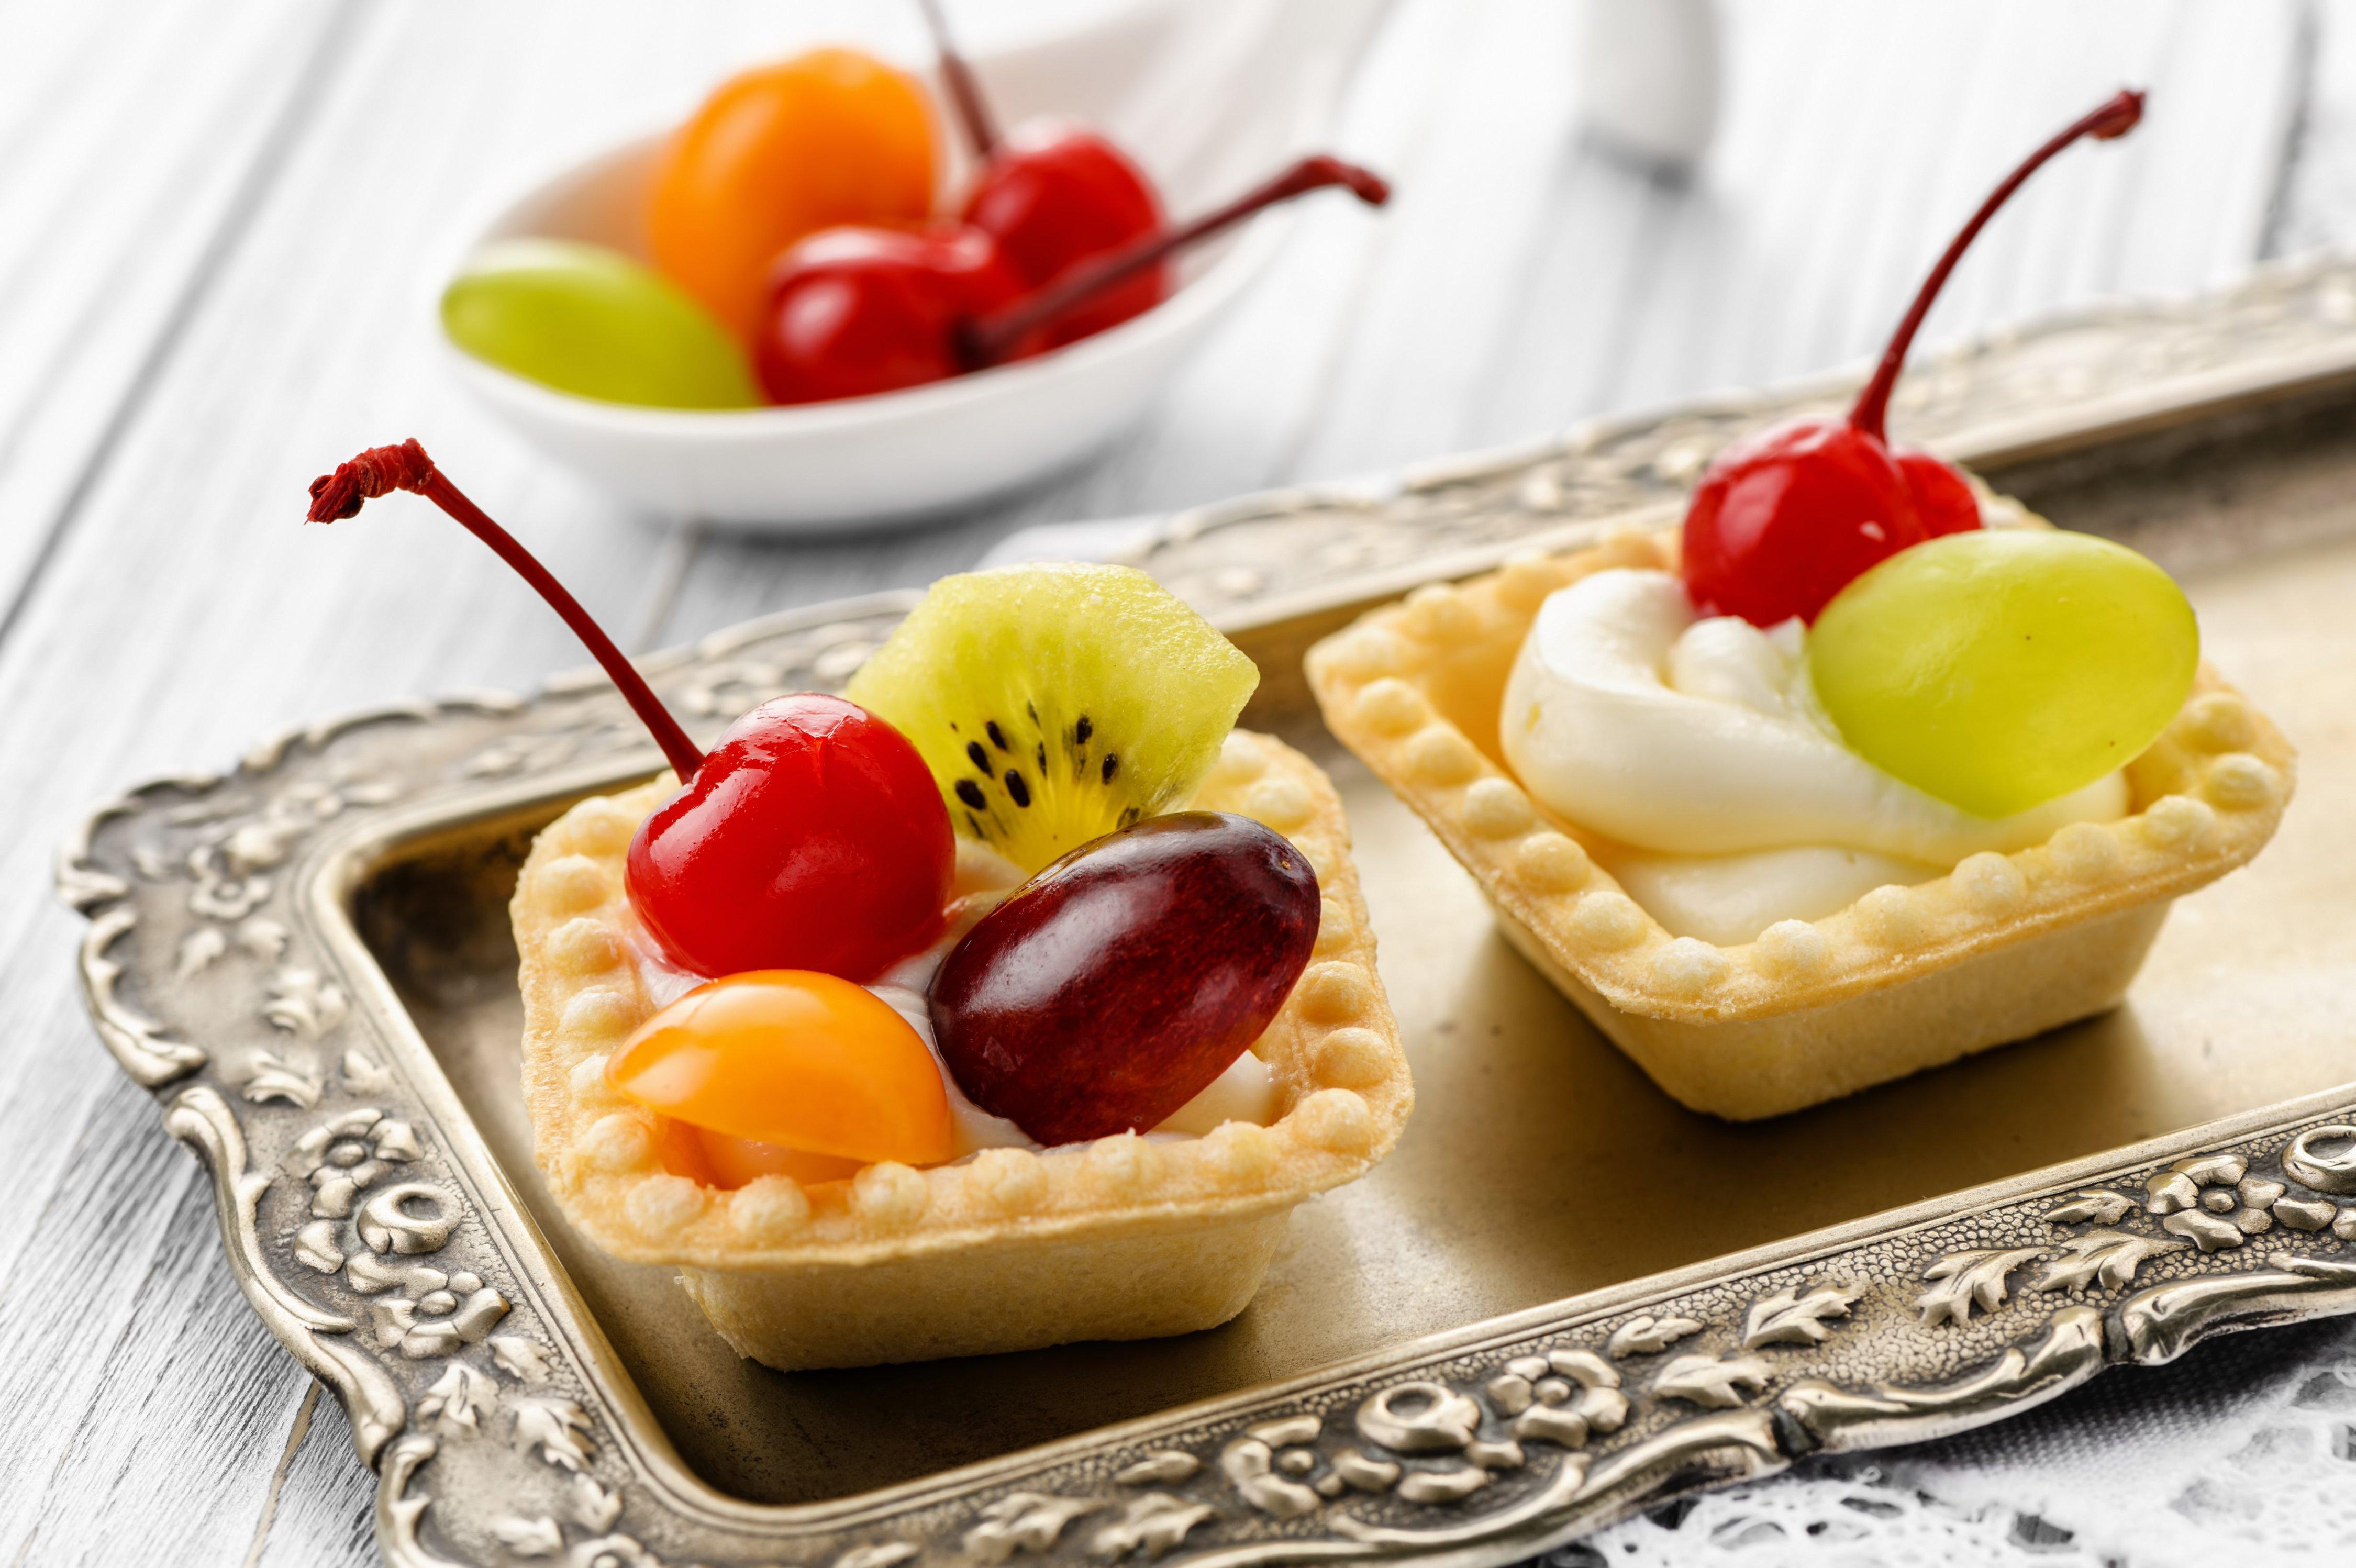 тарталетки с фруктами